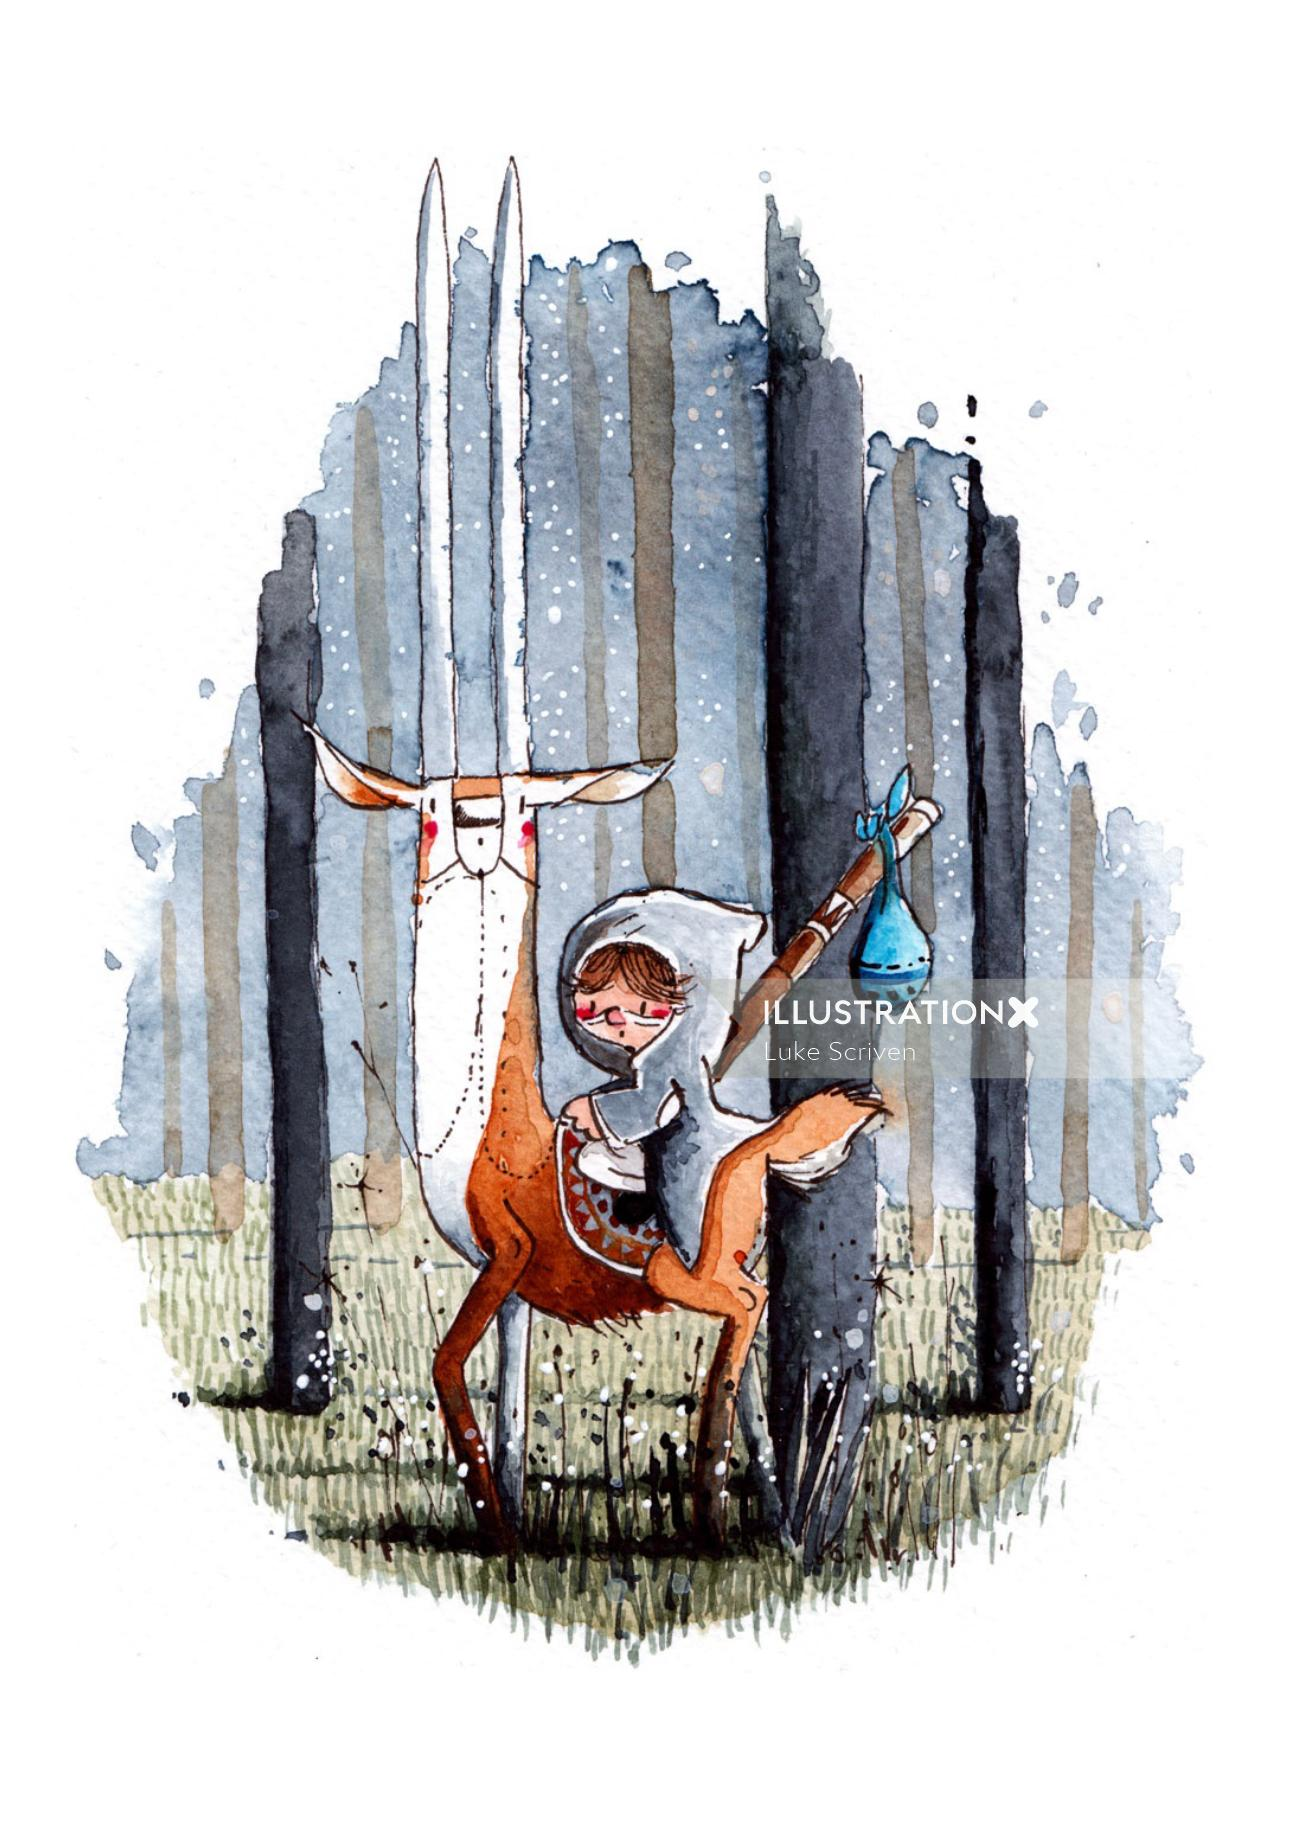 Children's illustration of kid and deer